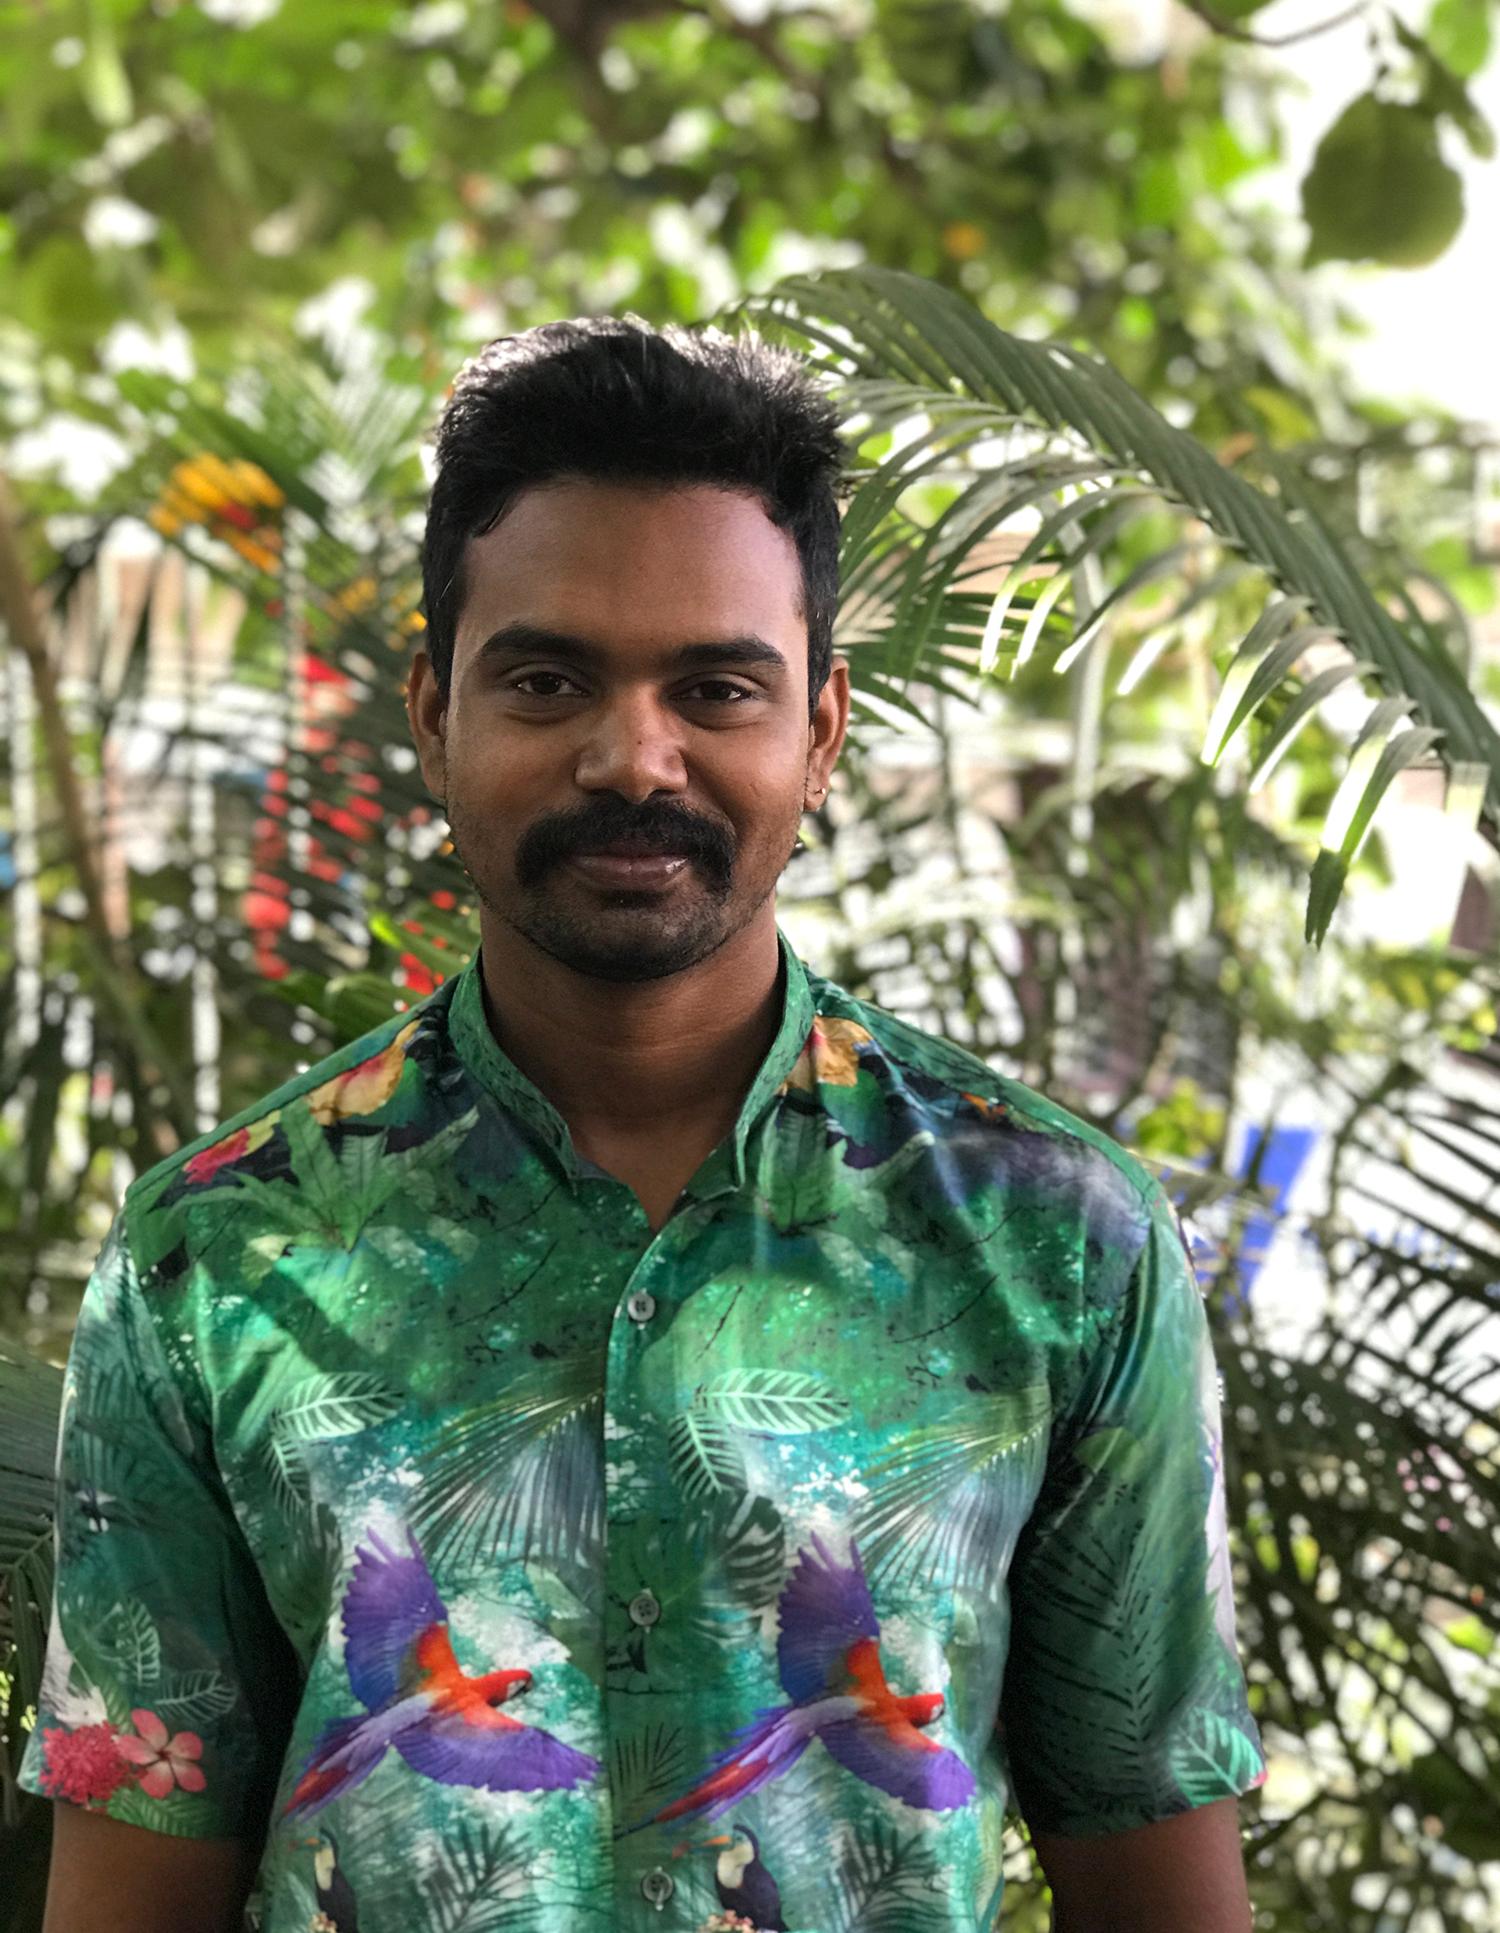 Sandeep TK from the 1Shanthiroad crew.